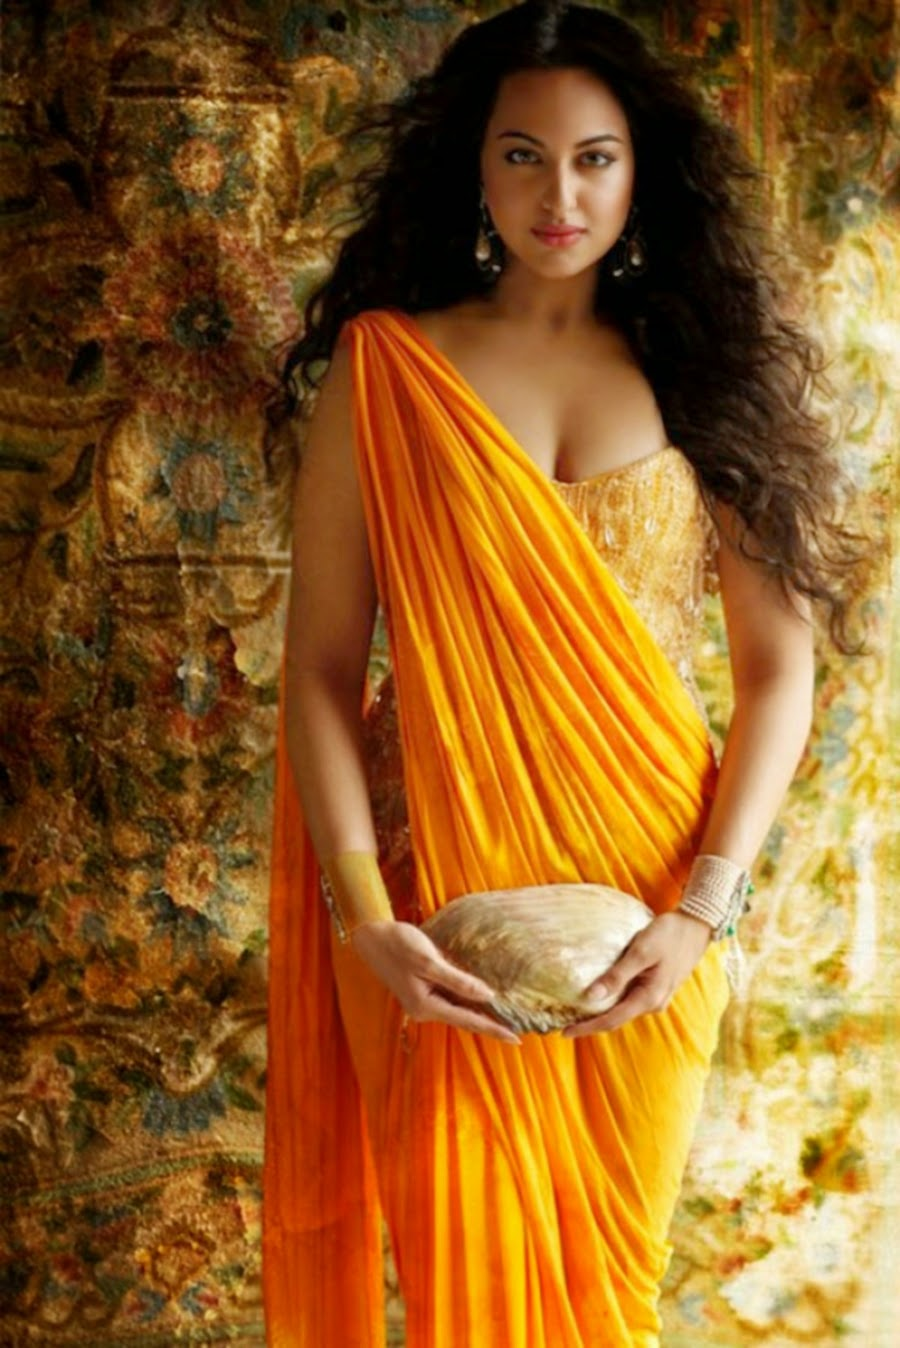 Indian angle porn